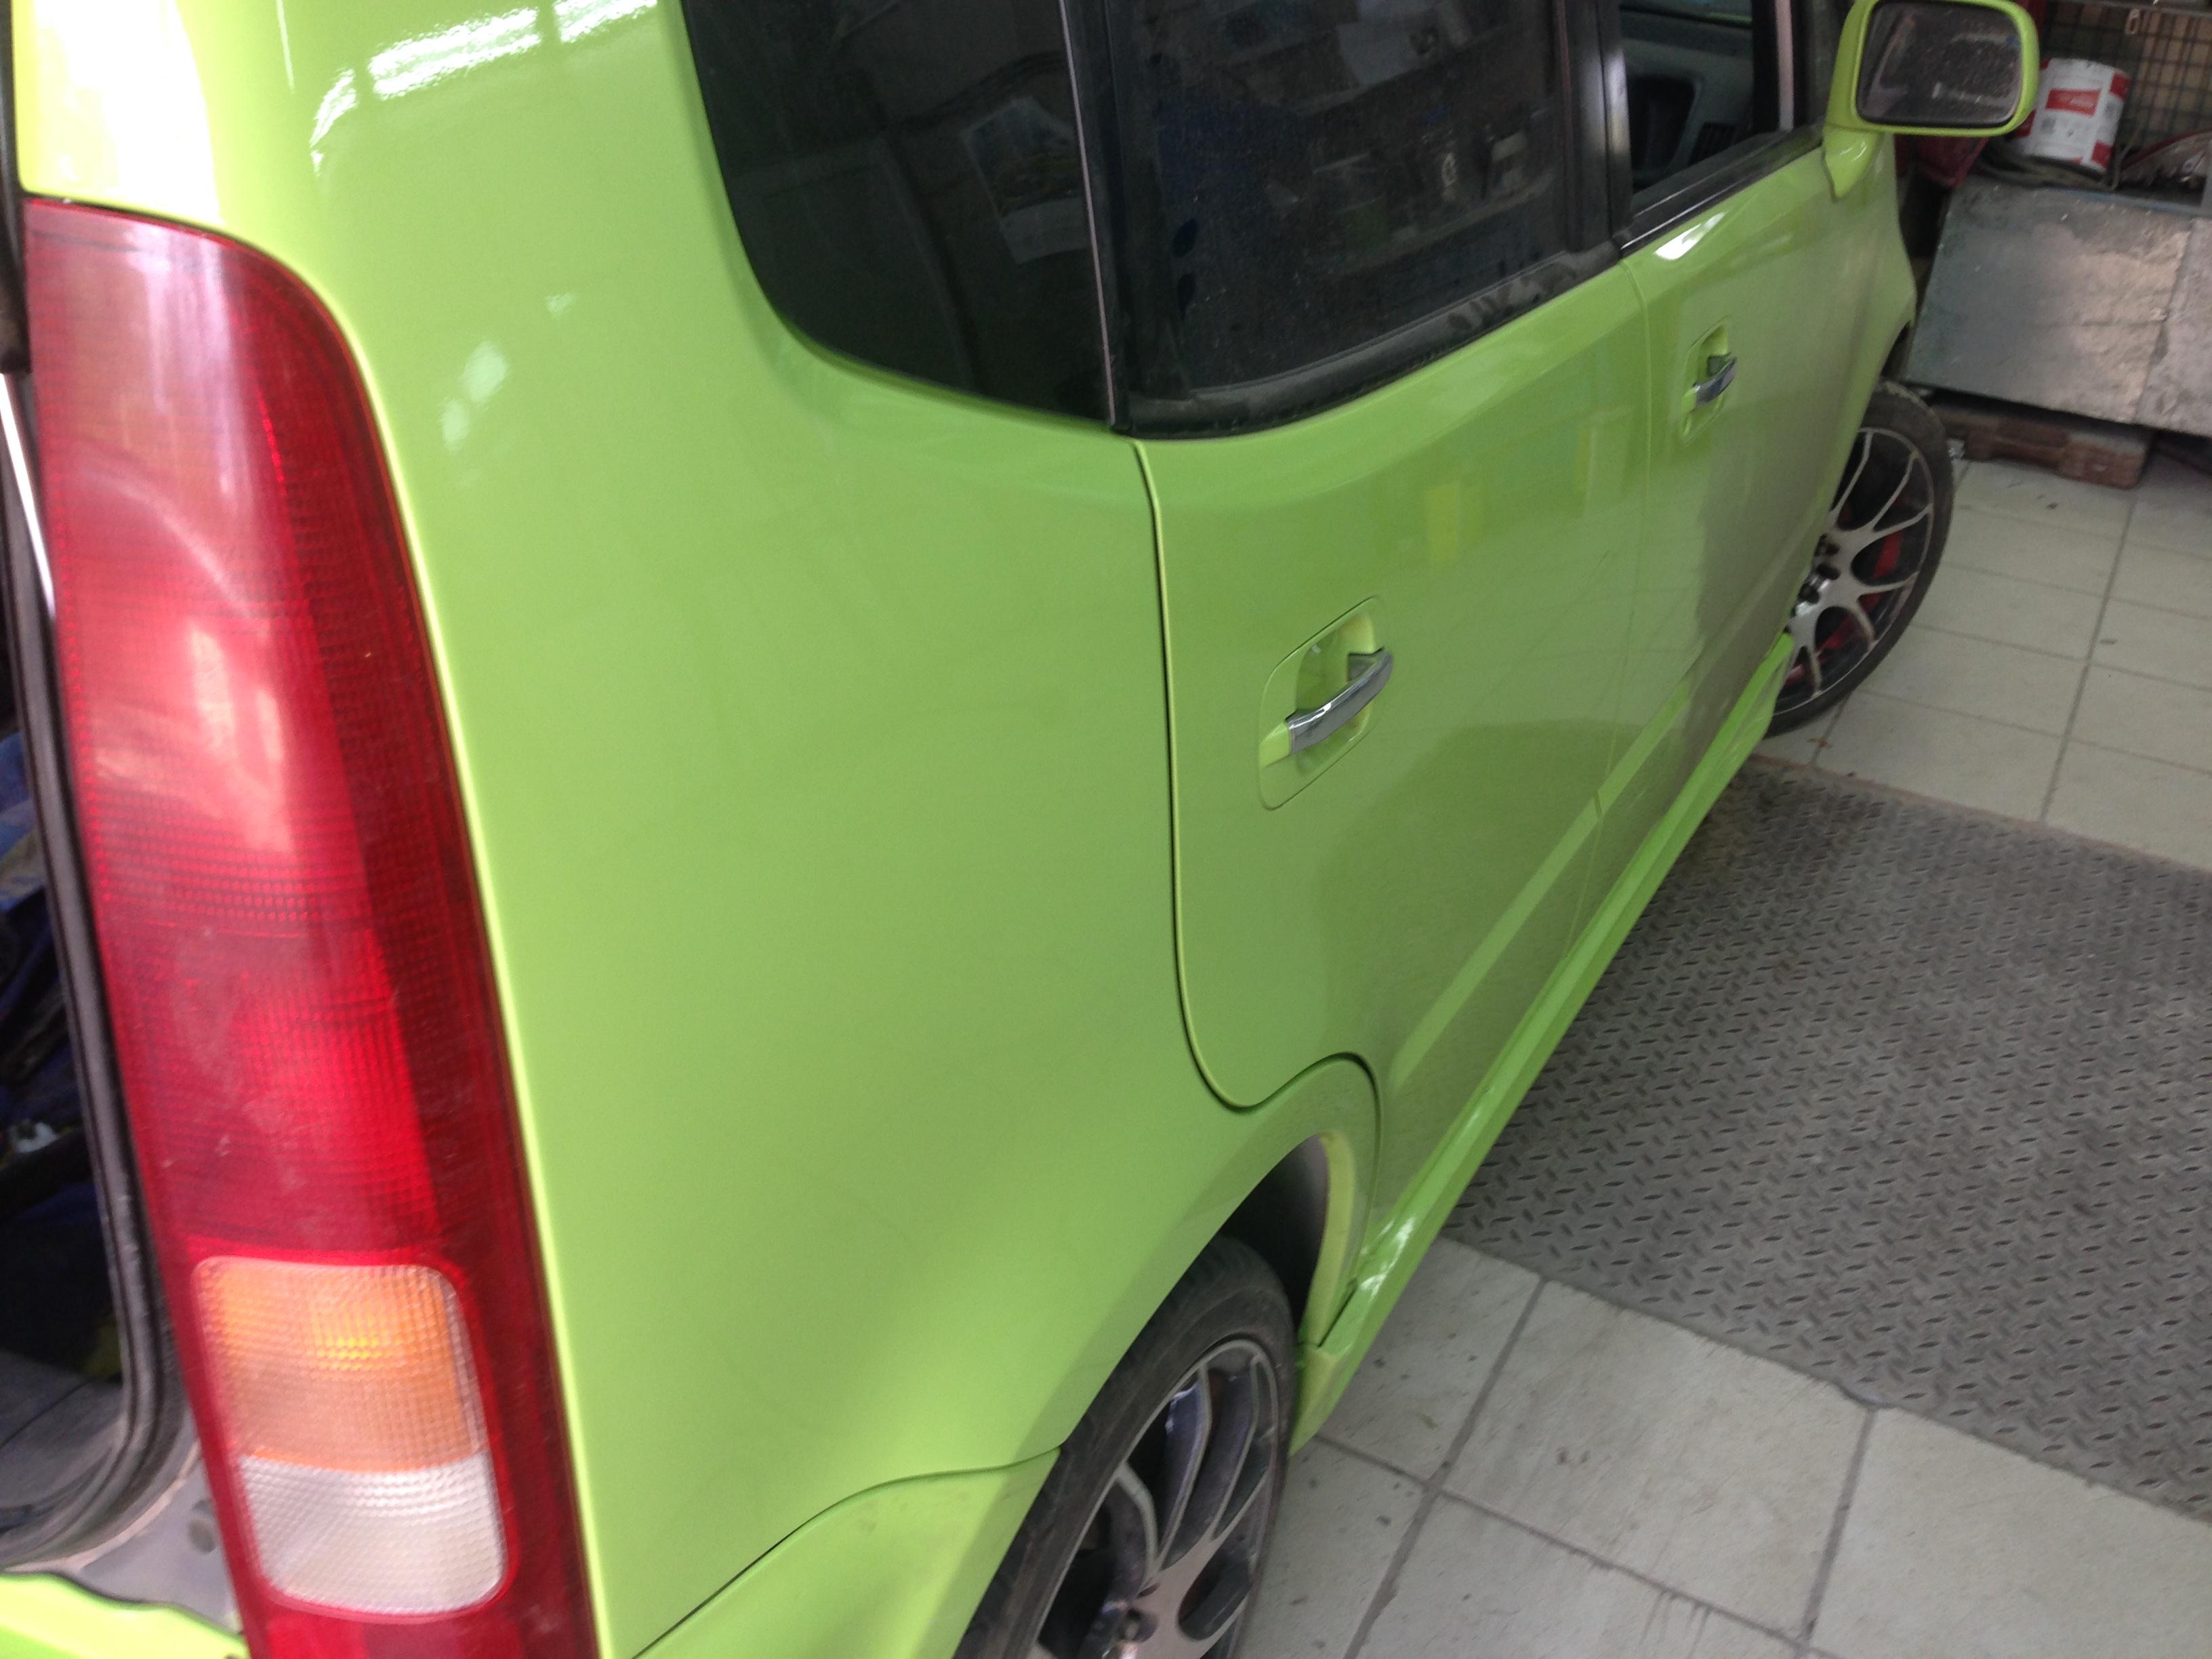 Honda Capa кузовной ремонт